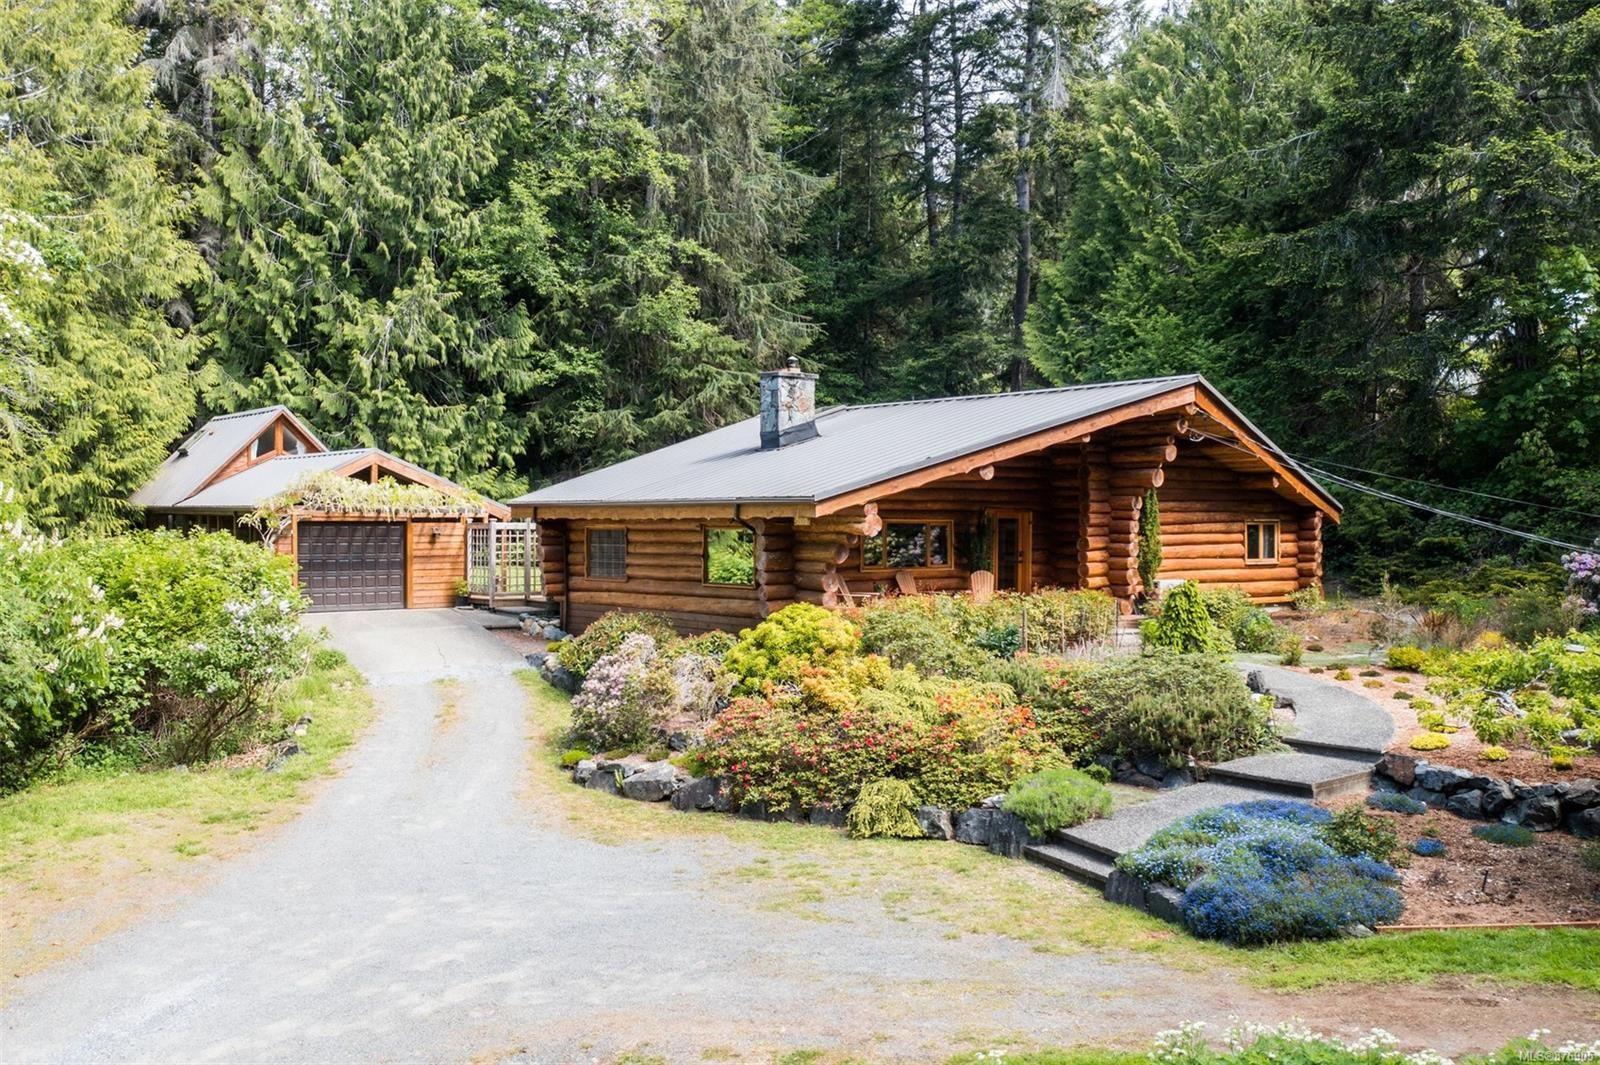 Main Photo: 2615 Boxer Rd in : Sk Kemp Lake House for sale (Sooke)  : MLS®# 876905